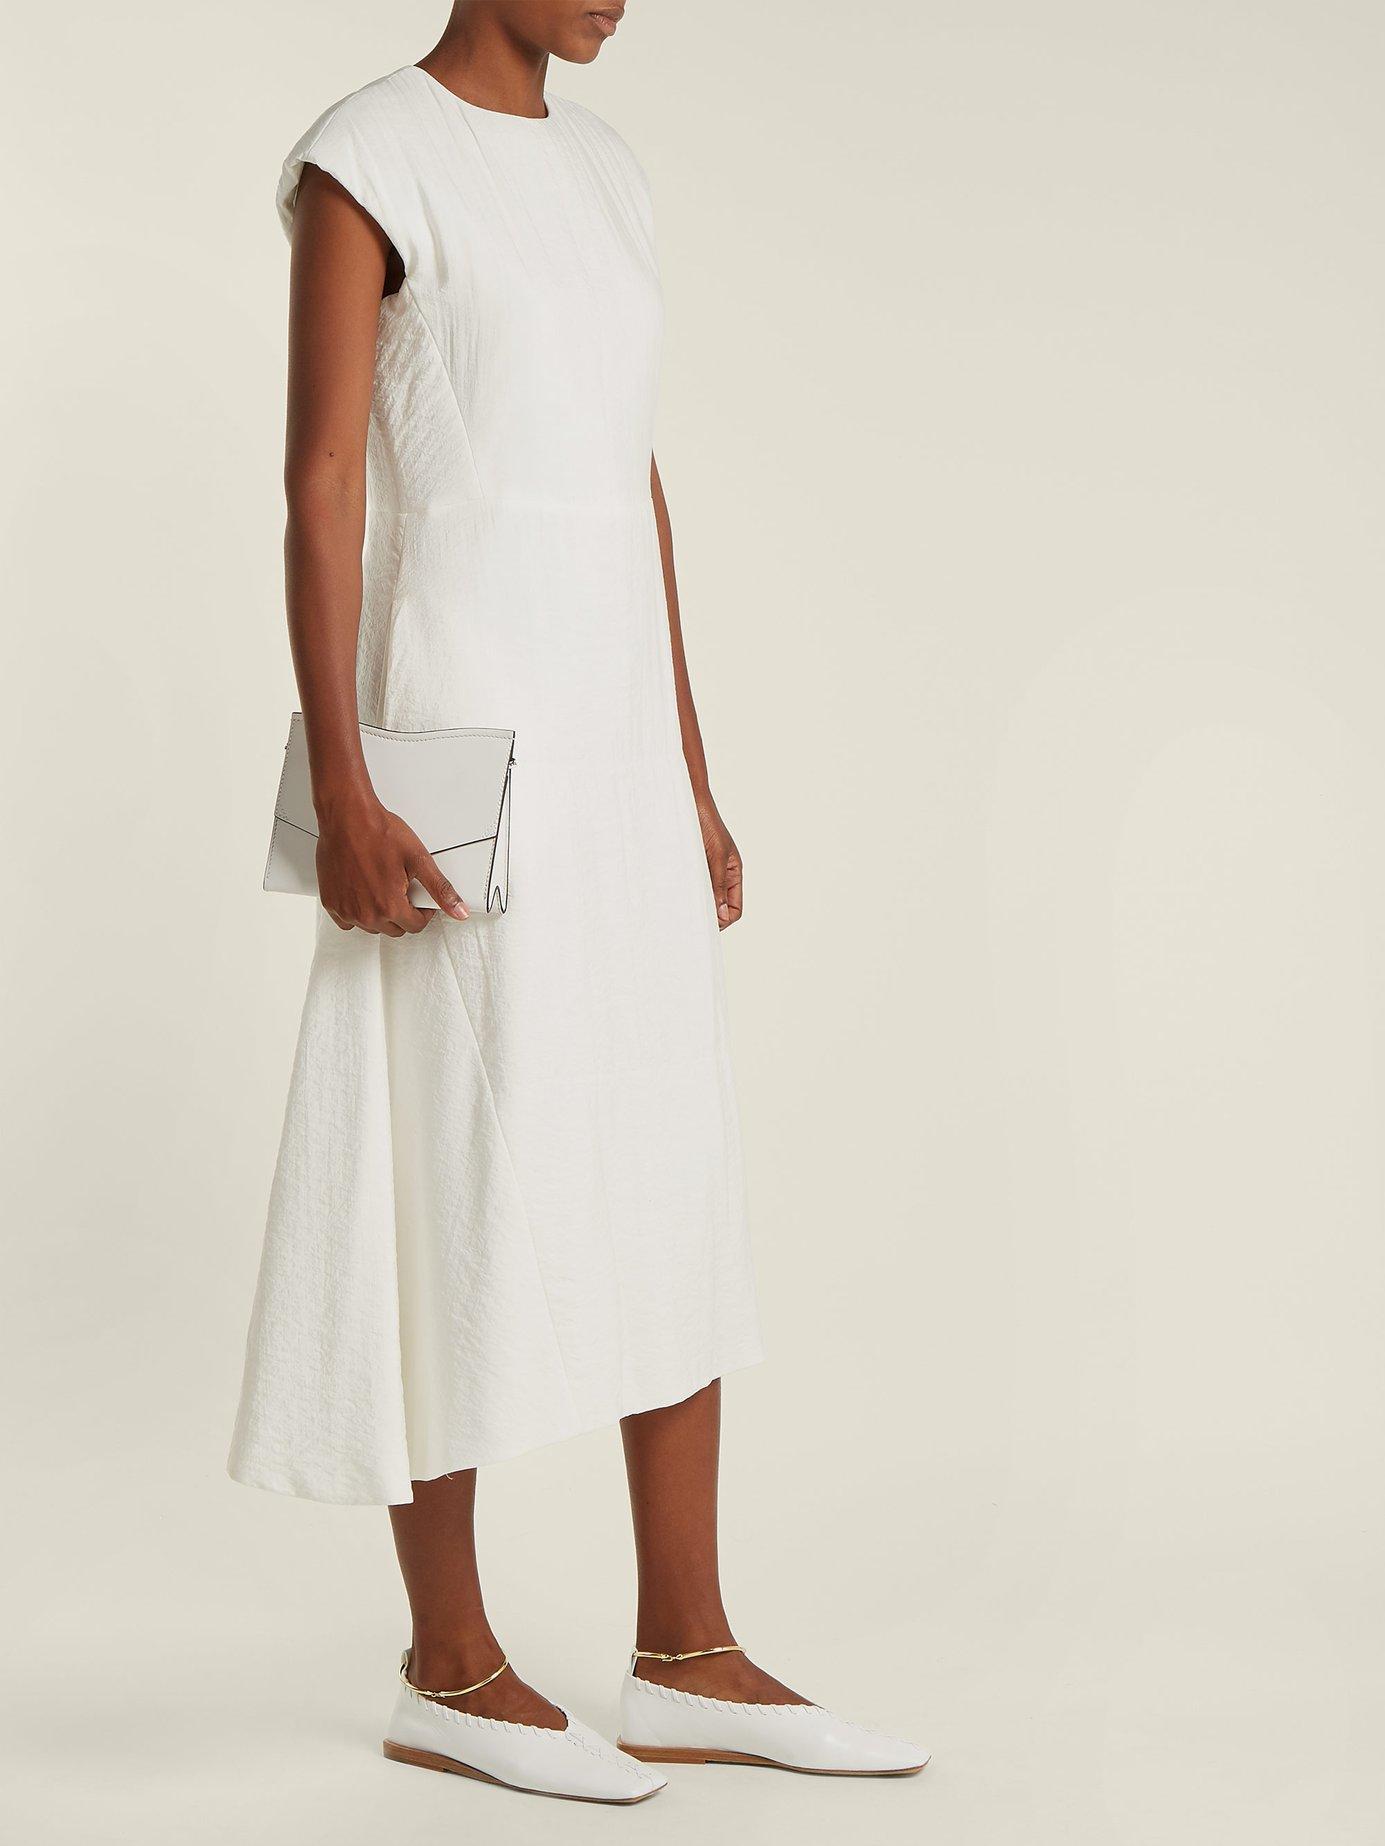 Fioretto silk-blend midi dress by Jil Sander